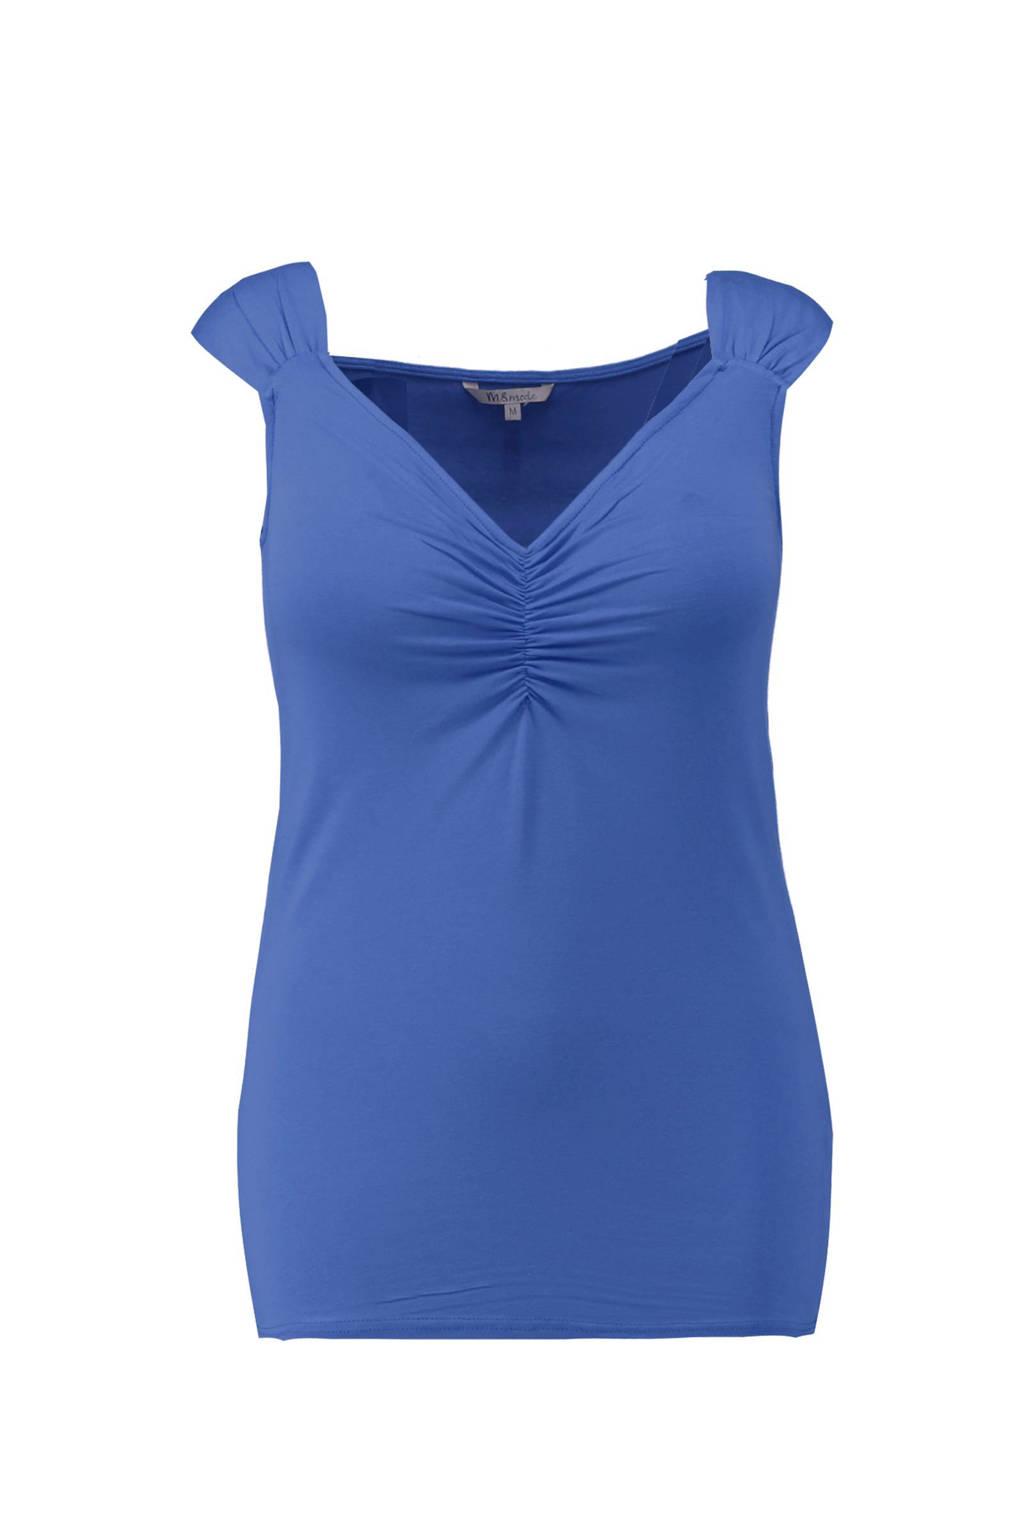 MS Mode T-shirt blauw, Kobalt blauw